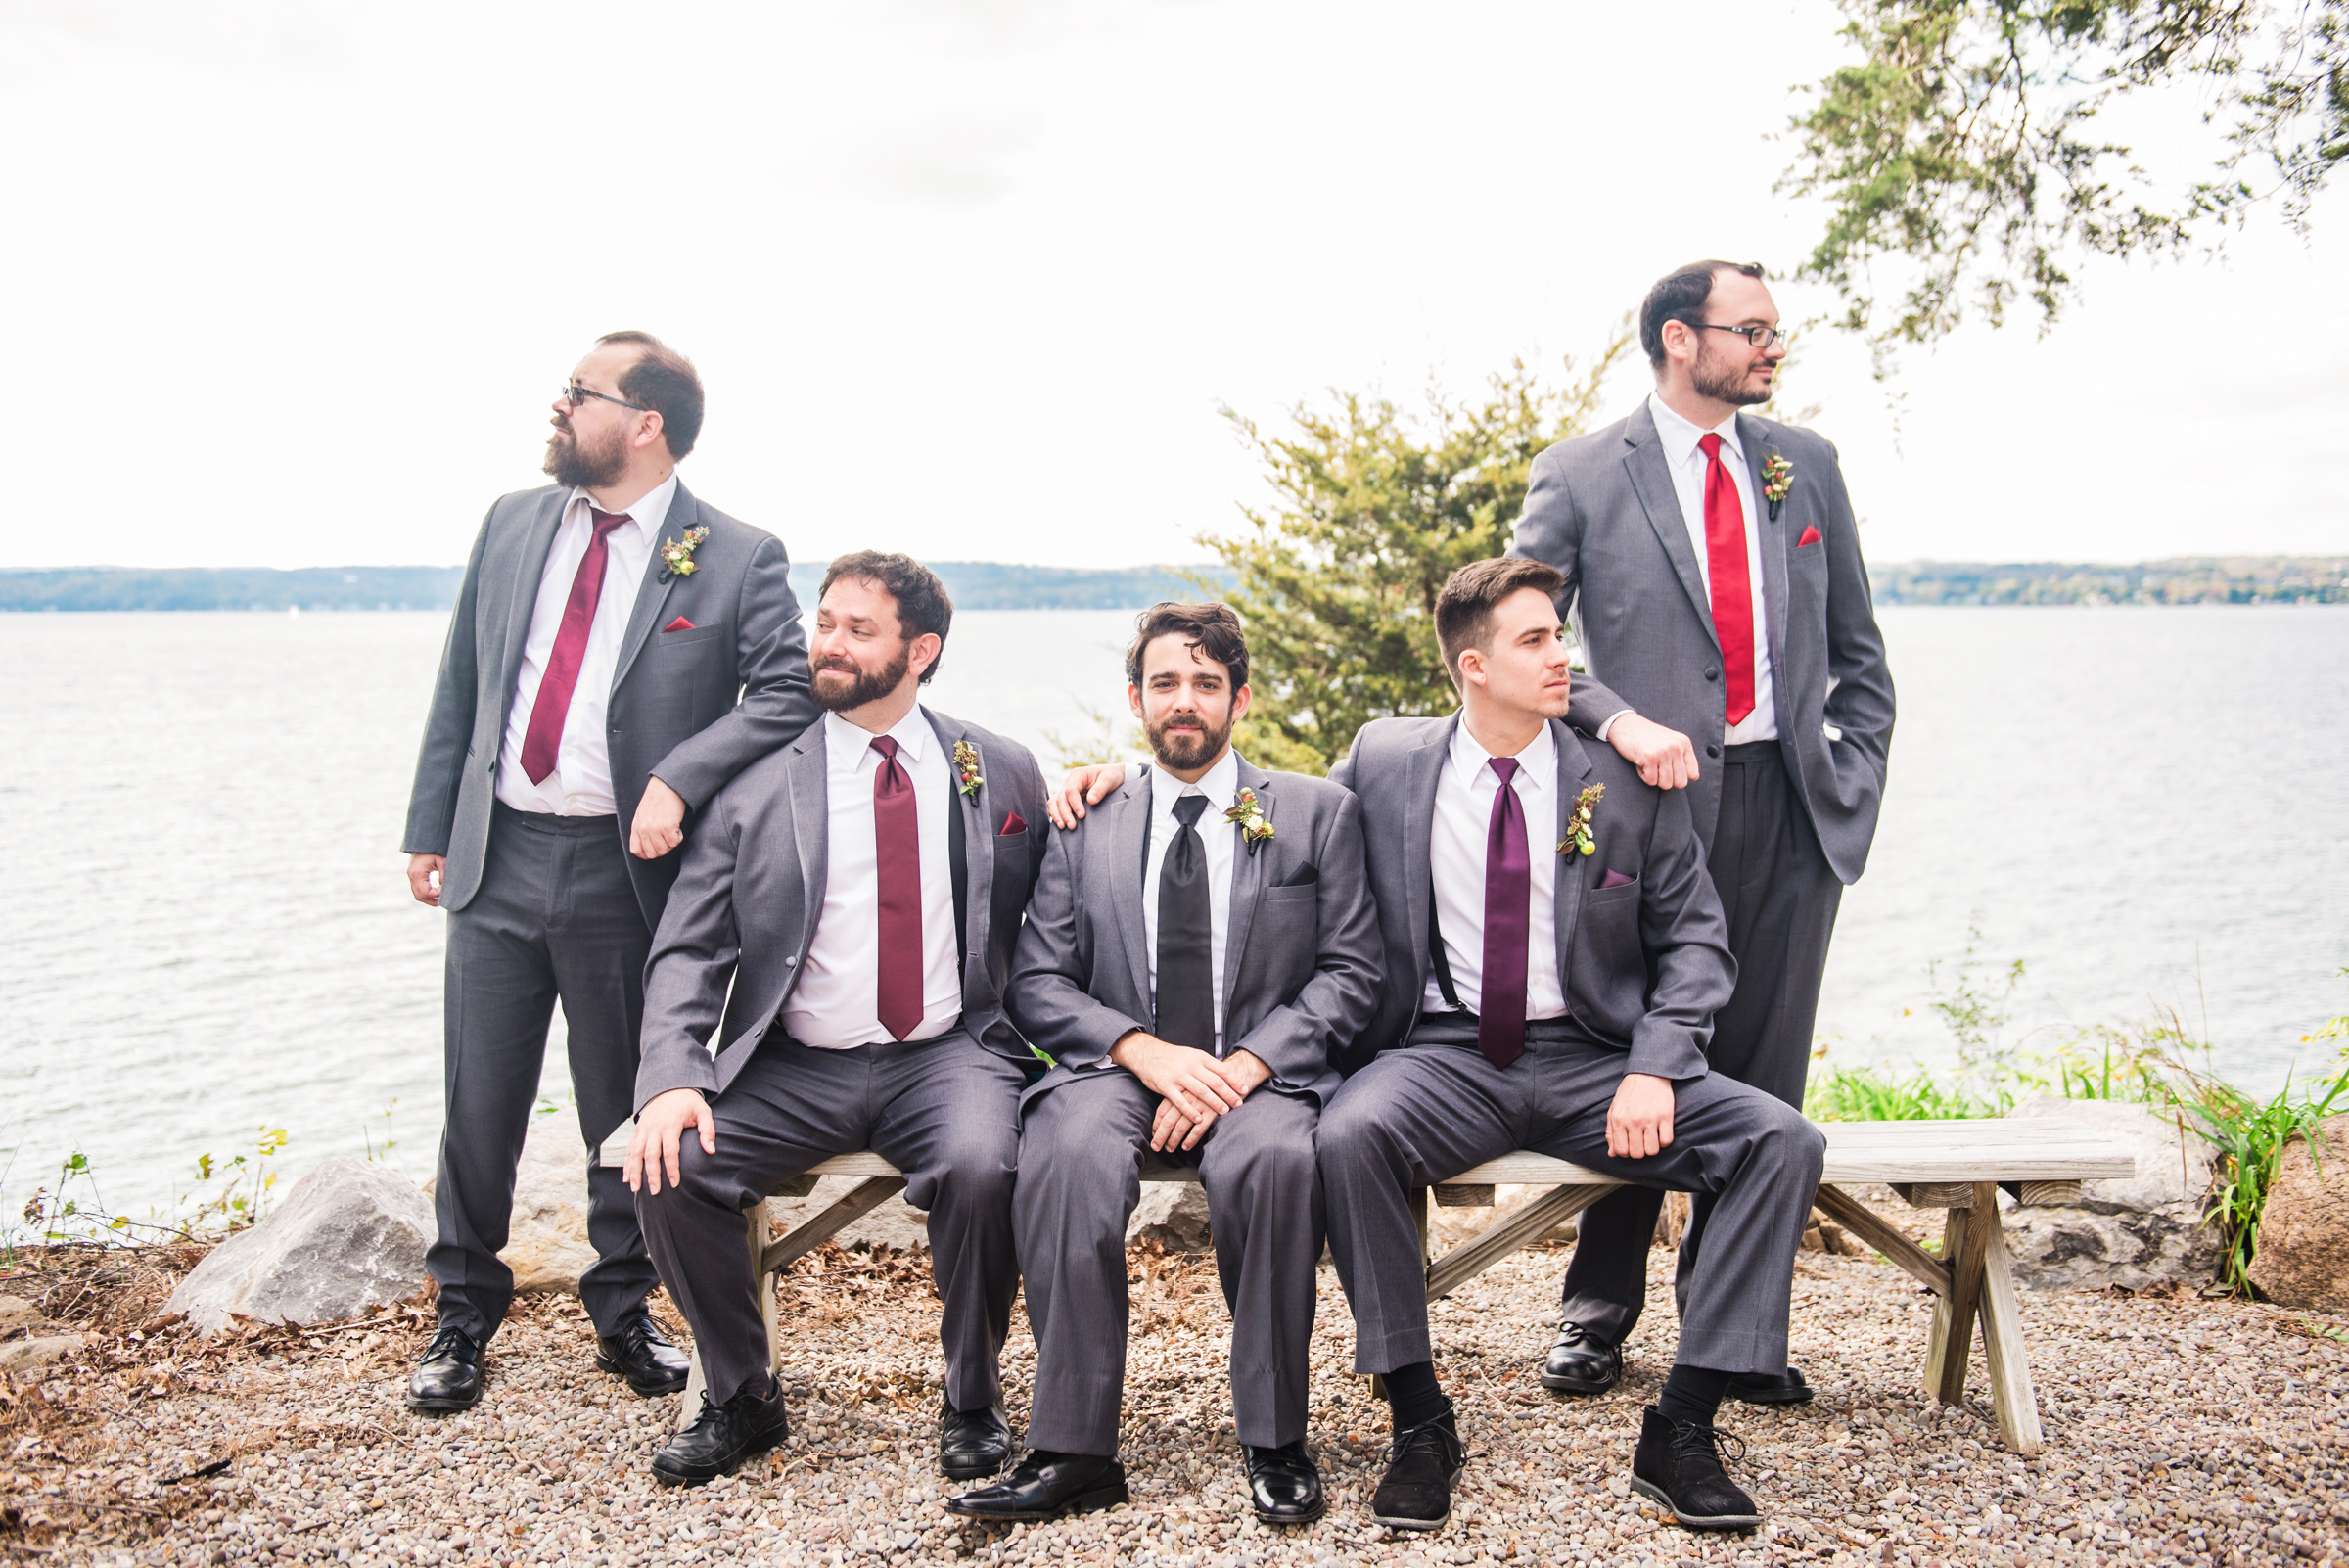 Zugibe_Vineyards_Finger_Lakes_Wedding_JILL_STUDIO_Rochester_NY_Photographer_DSC_3625.jpg